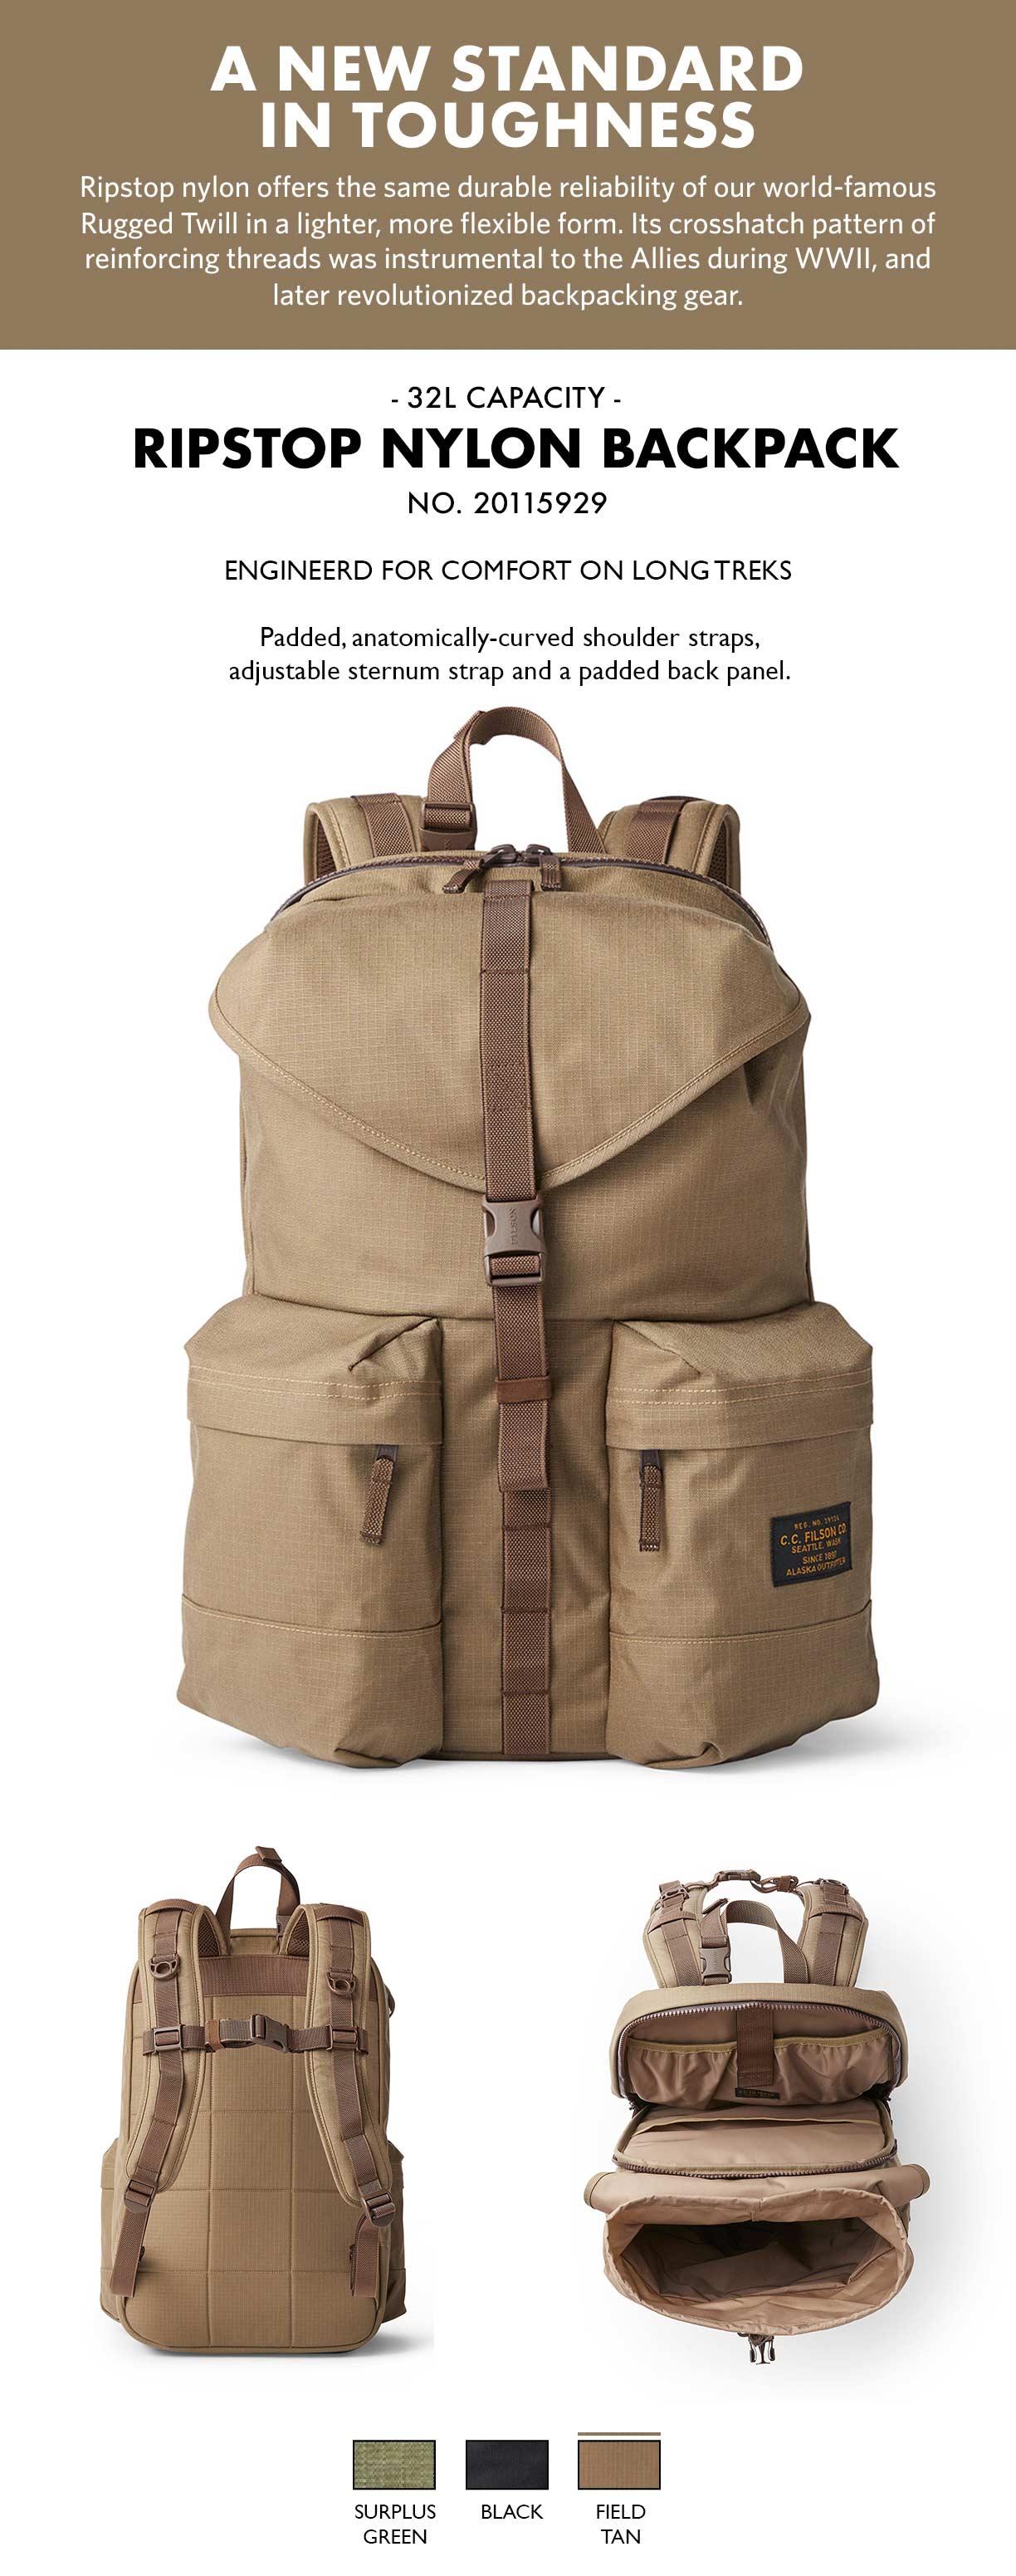 Filson Ripstop Backpack Field Tan Produkt-informationen